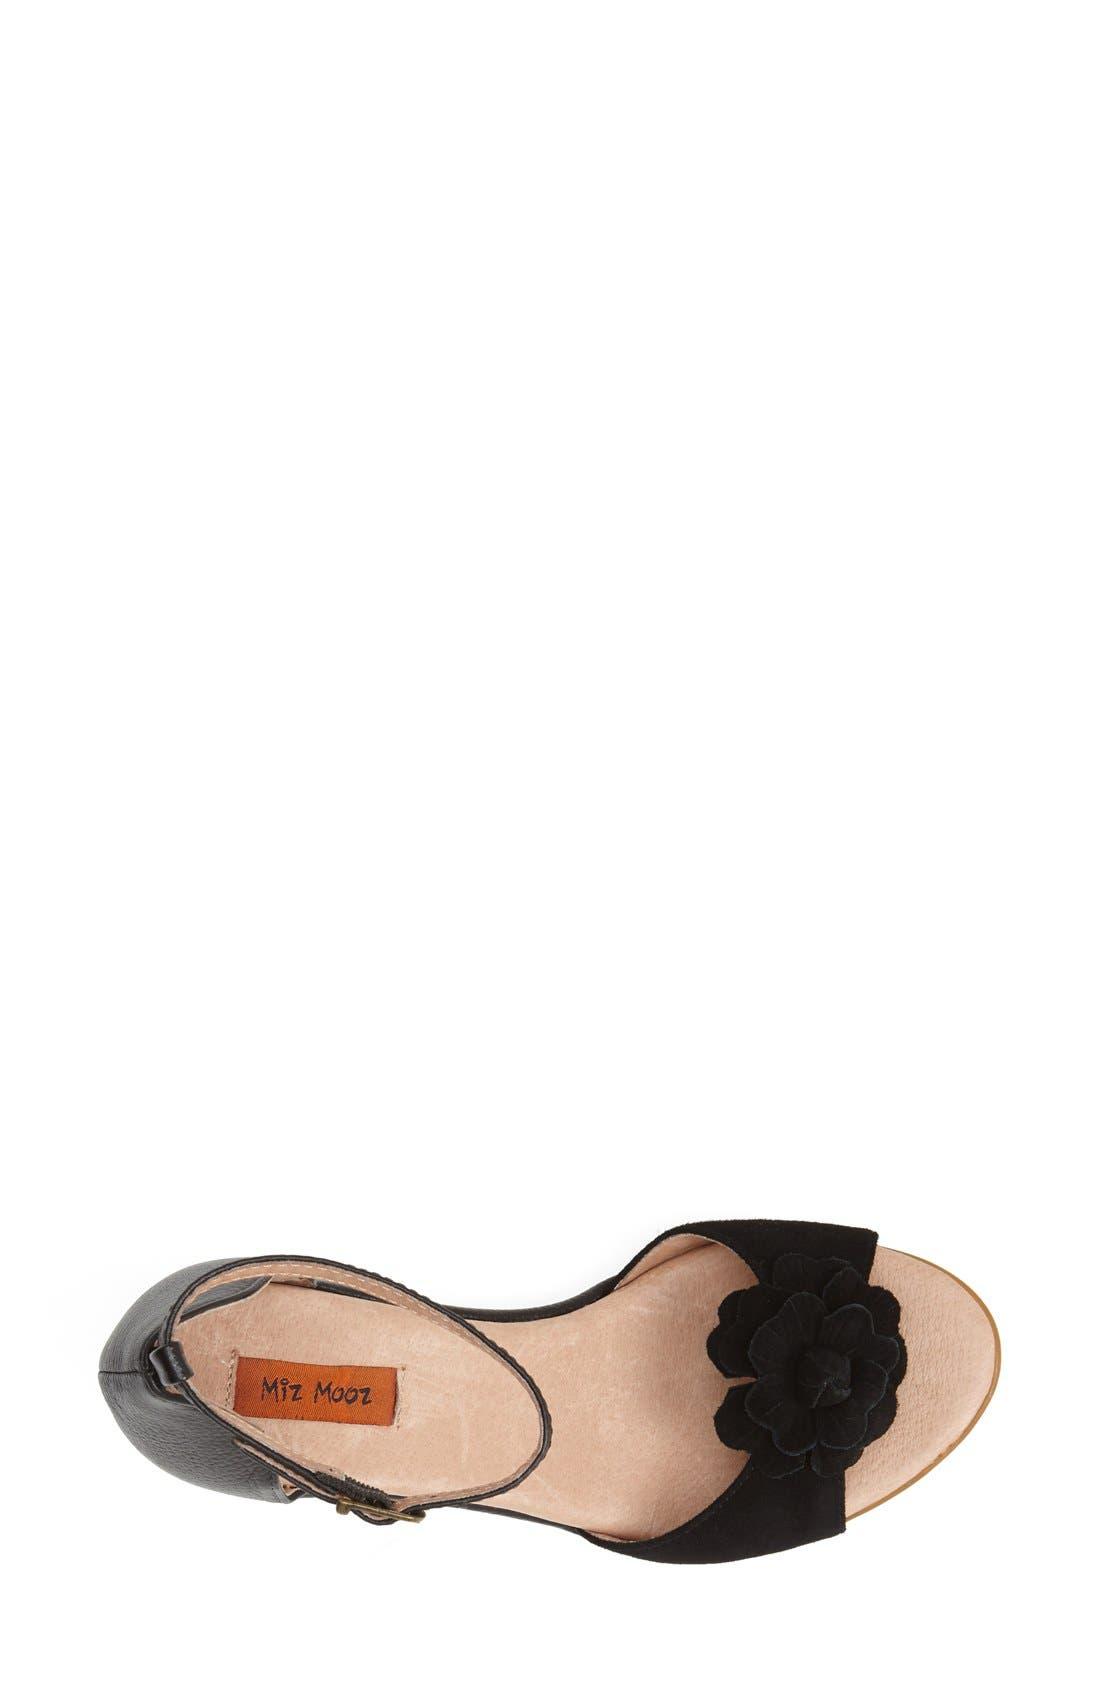 Alternate Image 3  - Miz Mooz 'Carmen' Leather Wedge Sandal (Women)(Special Purchase)